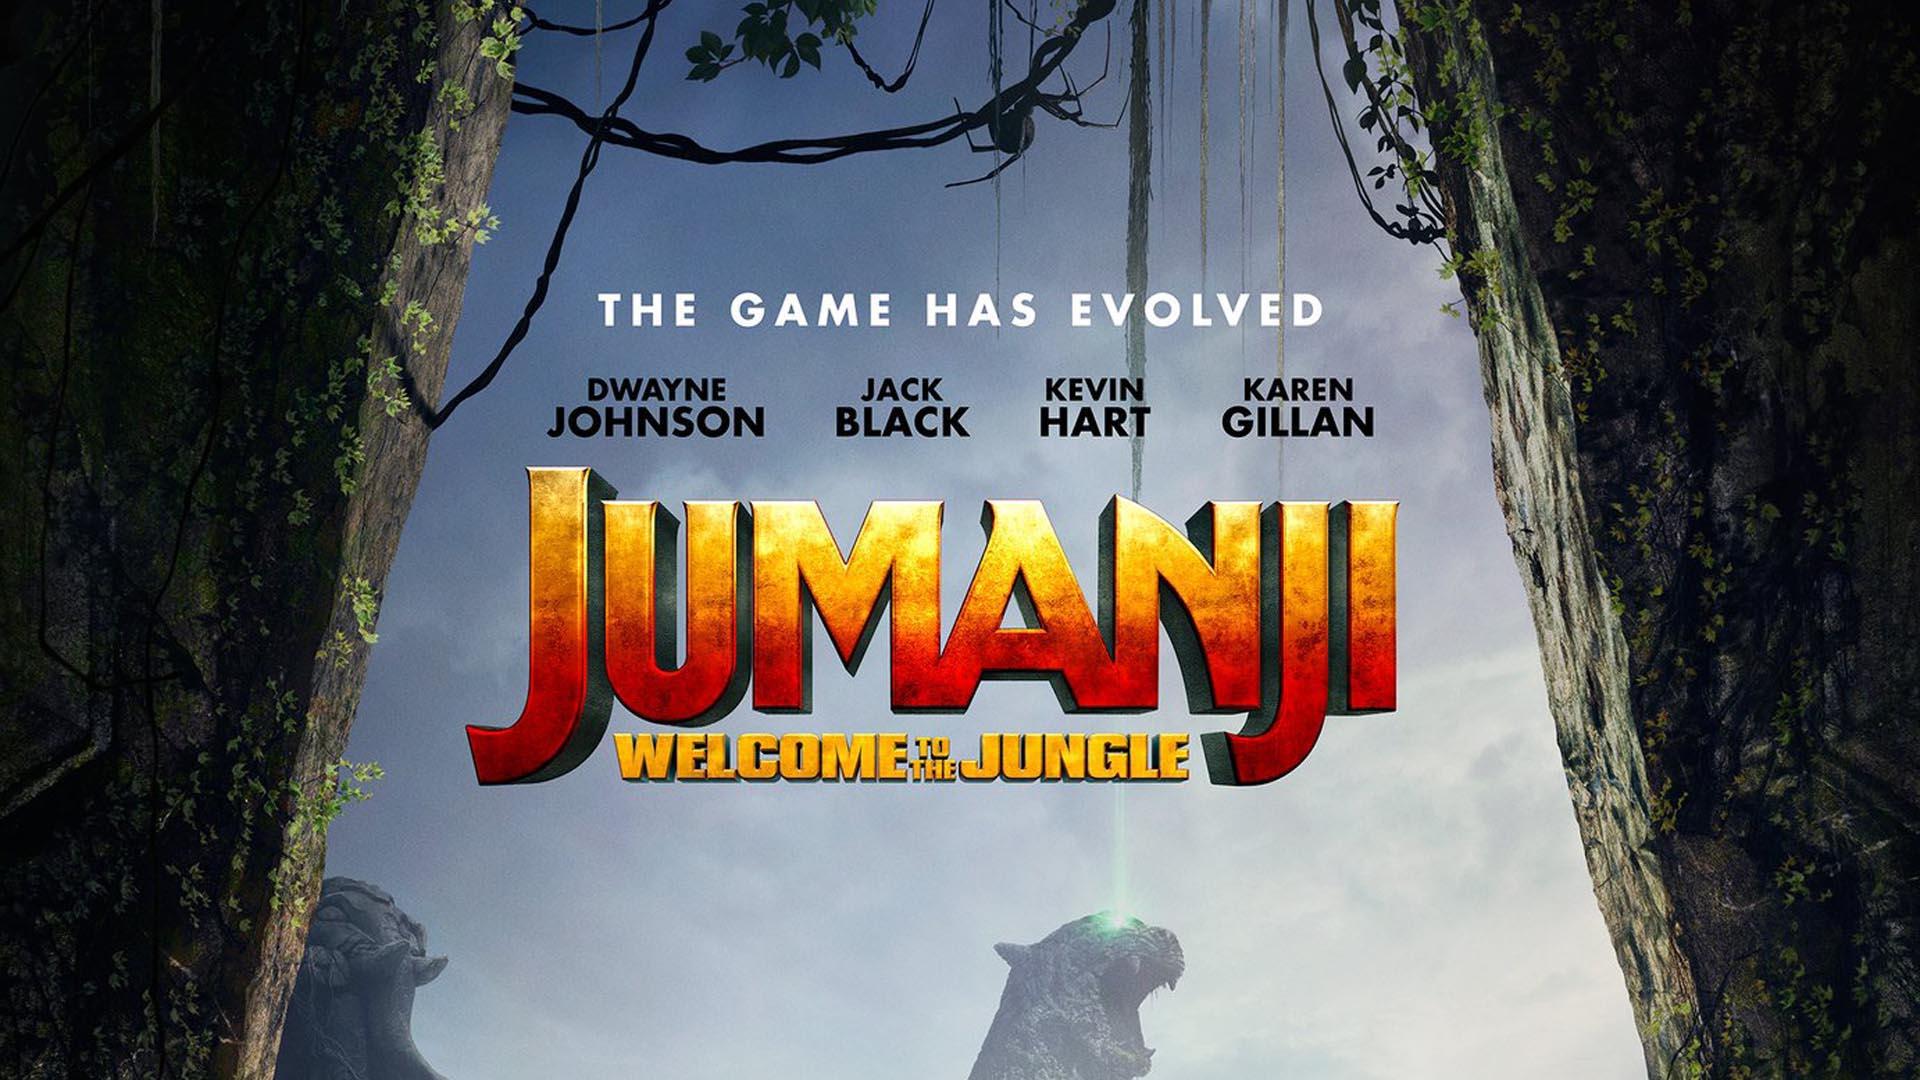 jumanji welcome to the jungle movie wallpaper 62107